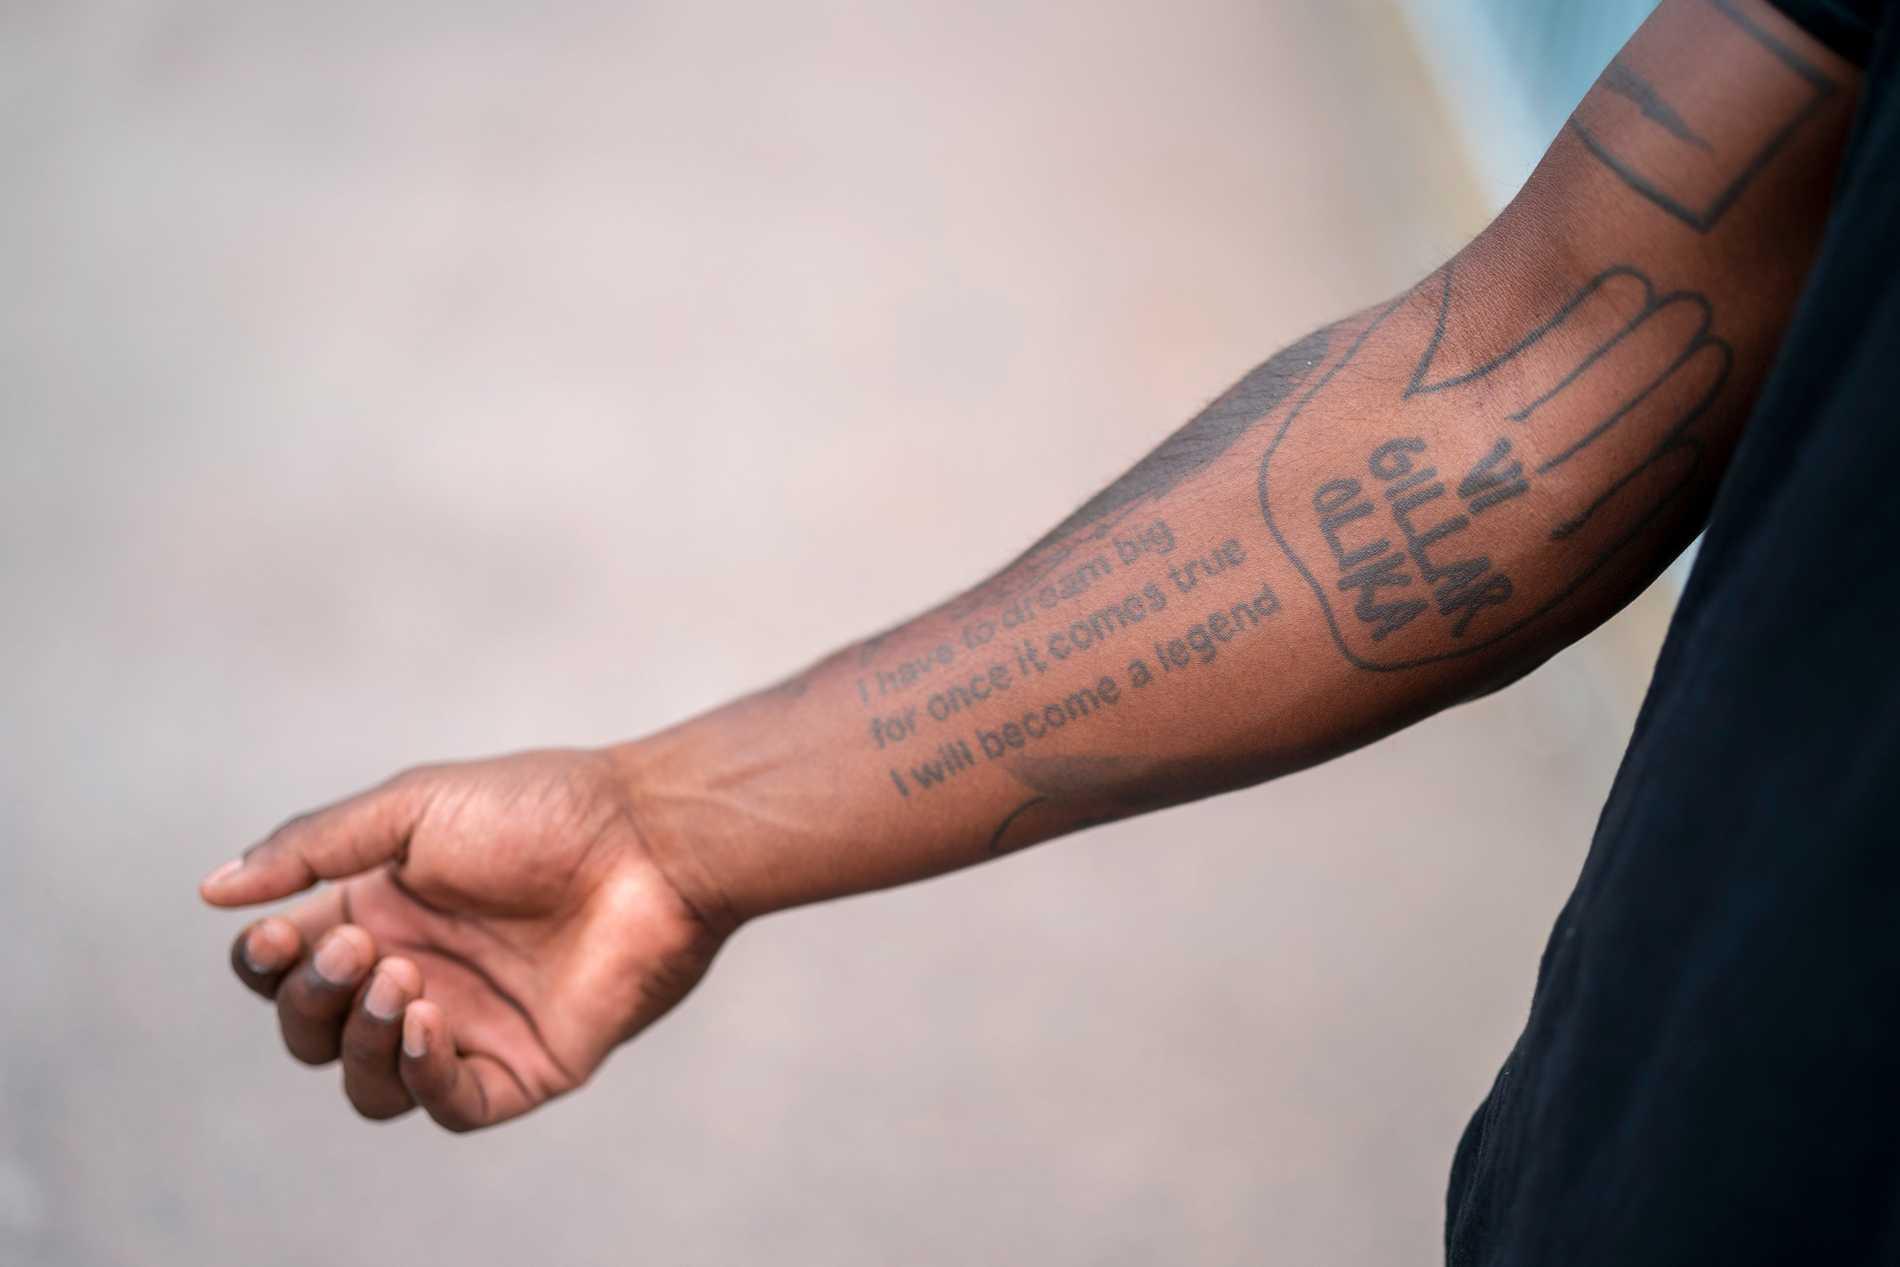 """I have to dream big for once it comes true, I will become a legend"" står det på Loui Sands underarm."